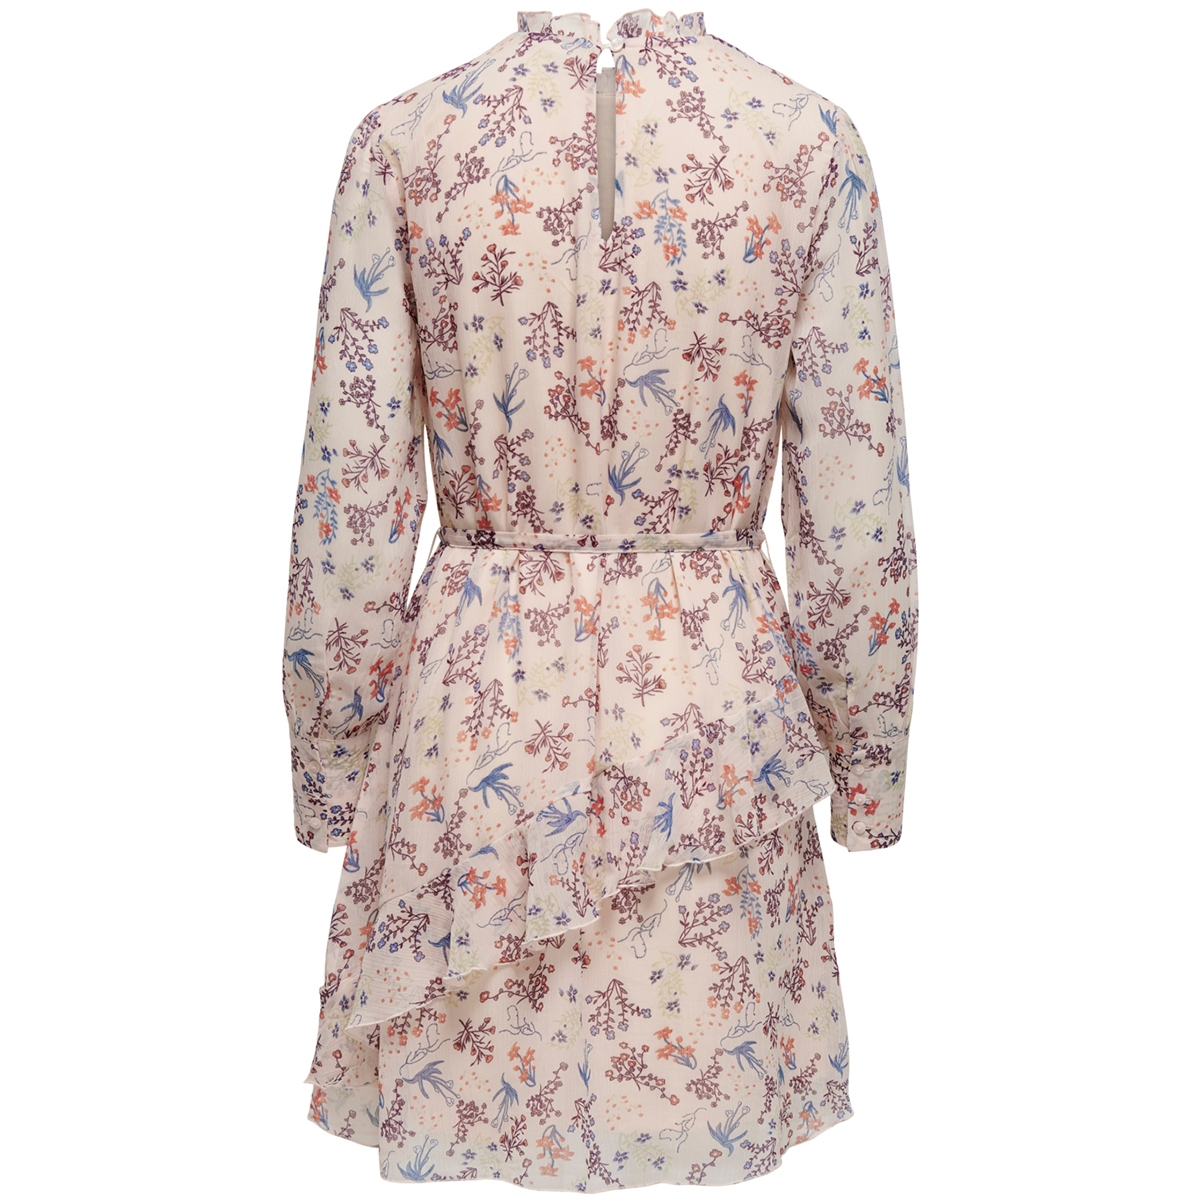 jdykippa l/s frill dress wvn 15200180 jacqueline de yong jurk sandshell/flowers